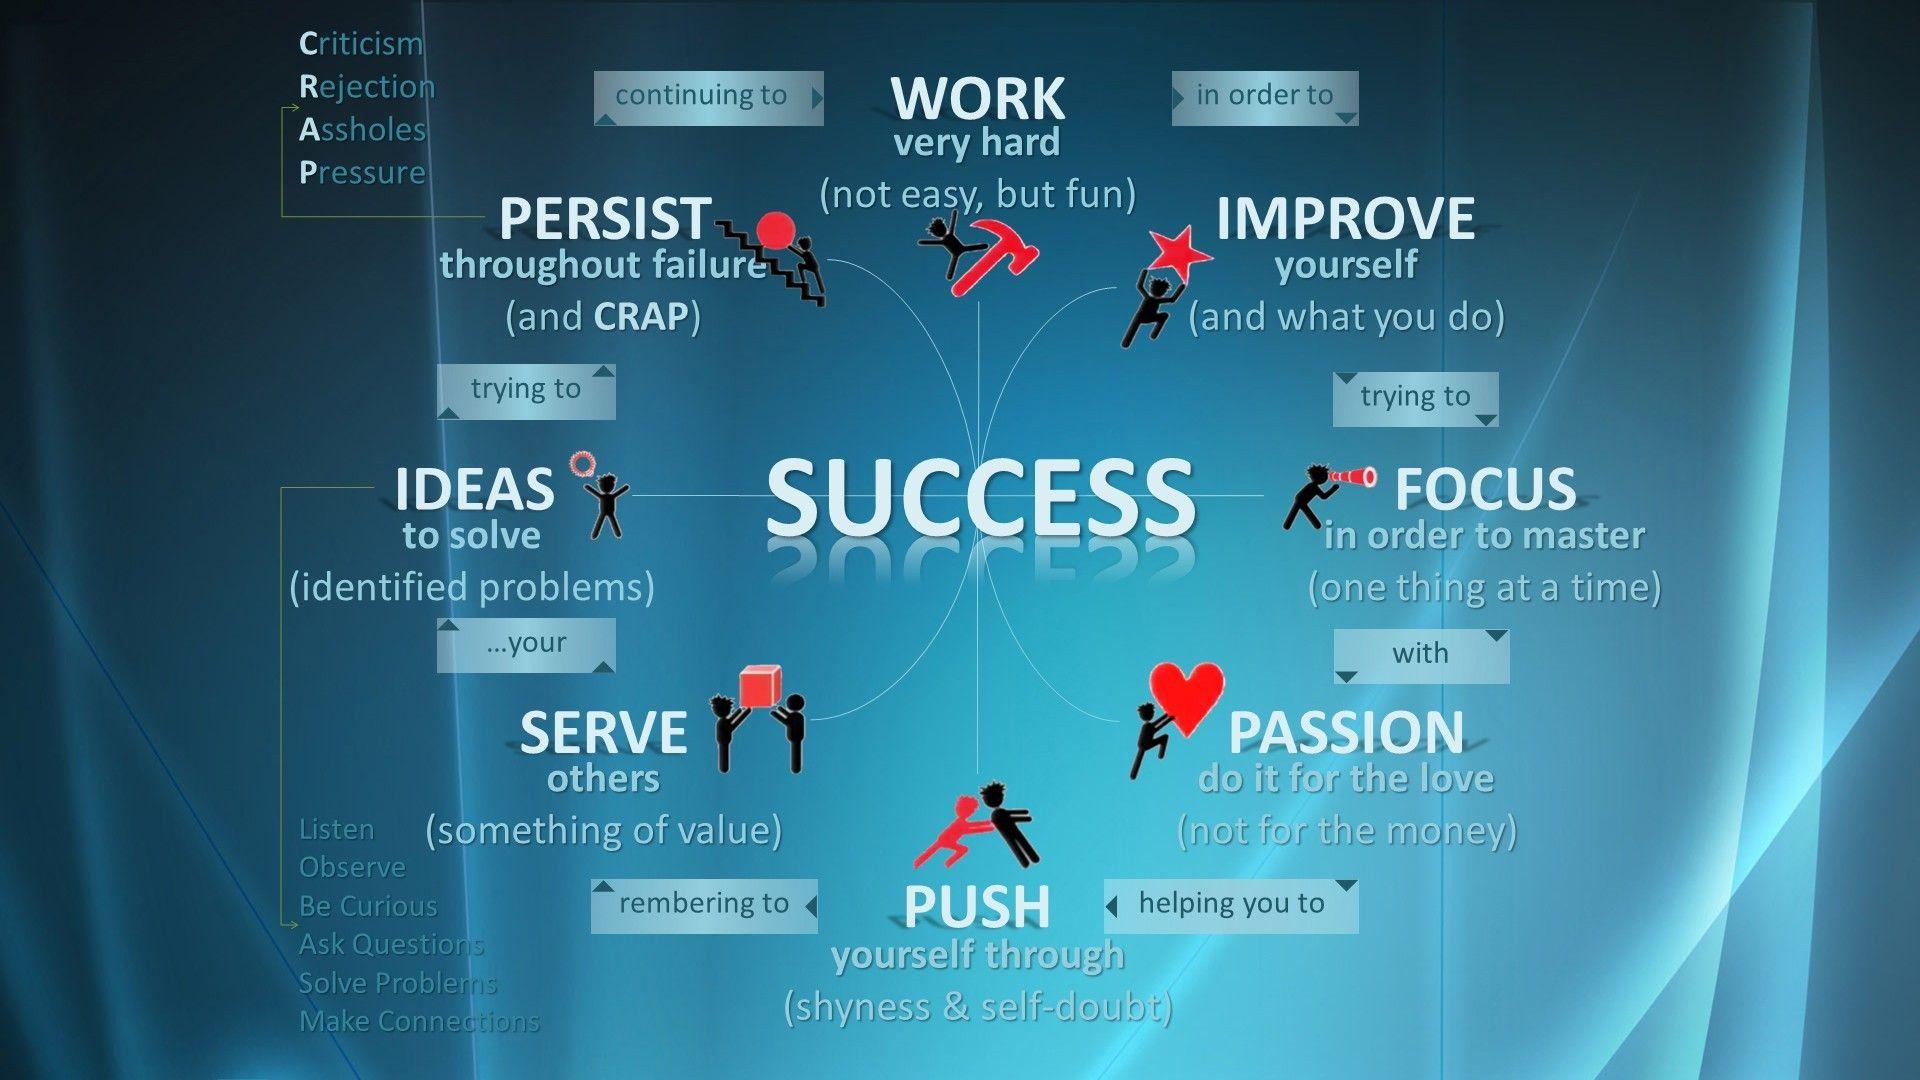 Success Hd Wallpaper 78 Images Motivational Quotes Wallpaper Inspirational Quotes Wallpapers Motivational Quotes For Success